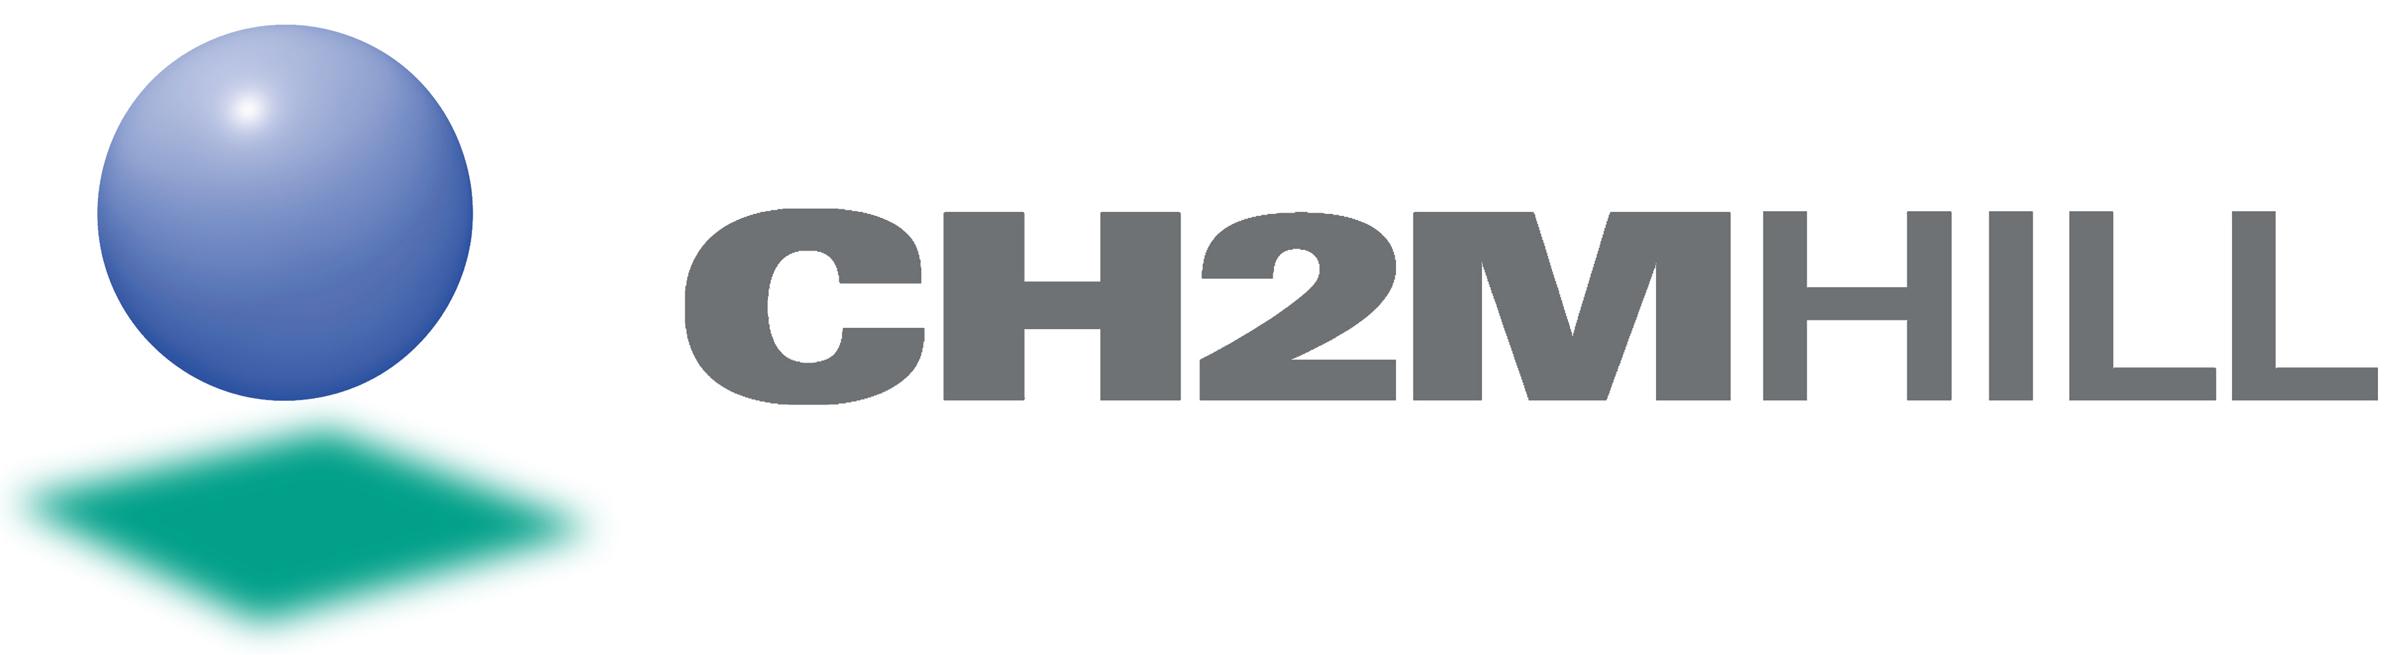 Ch2mhill logo